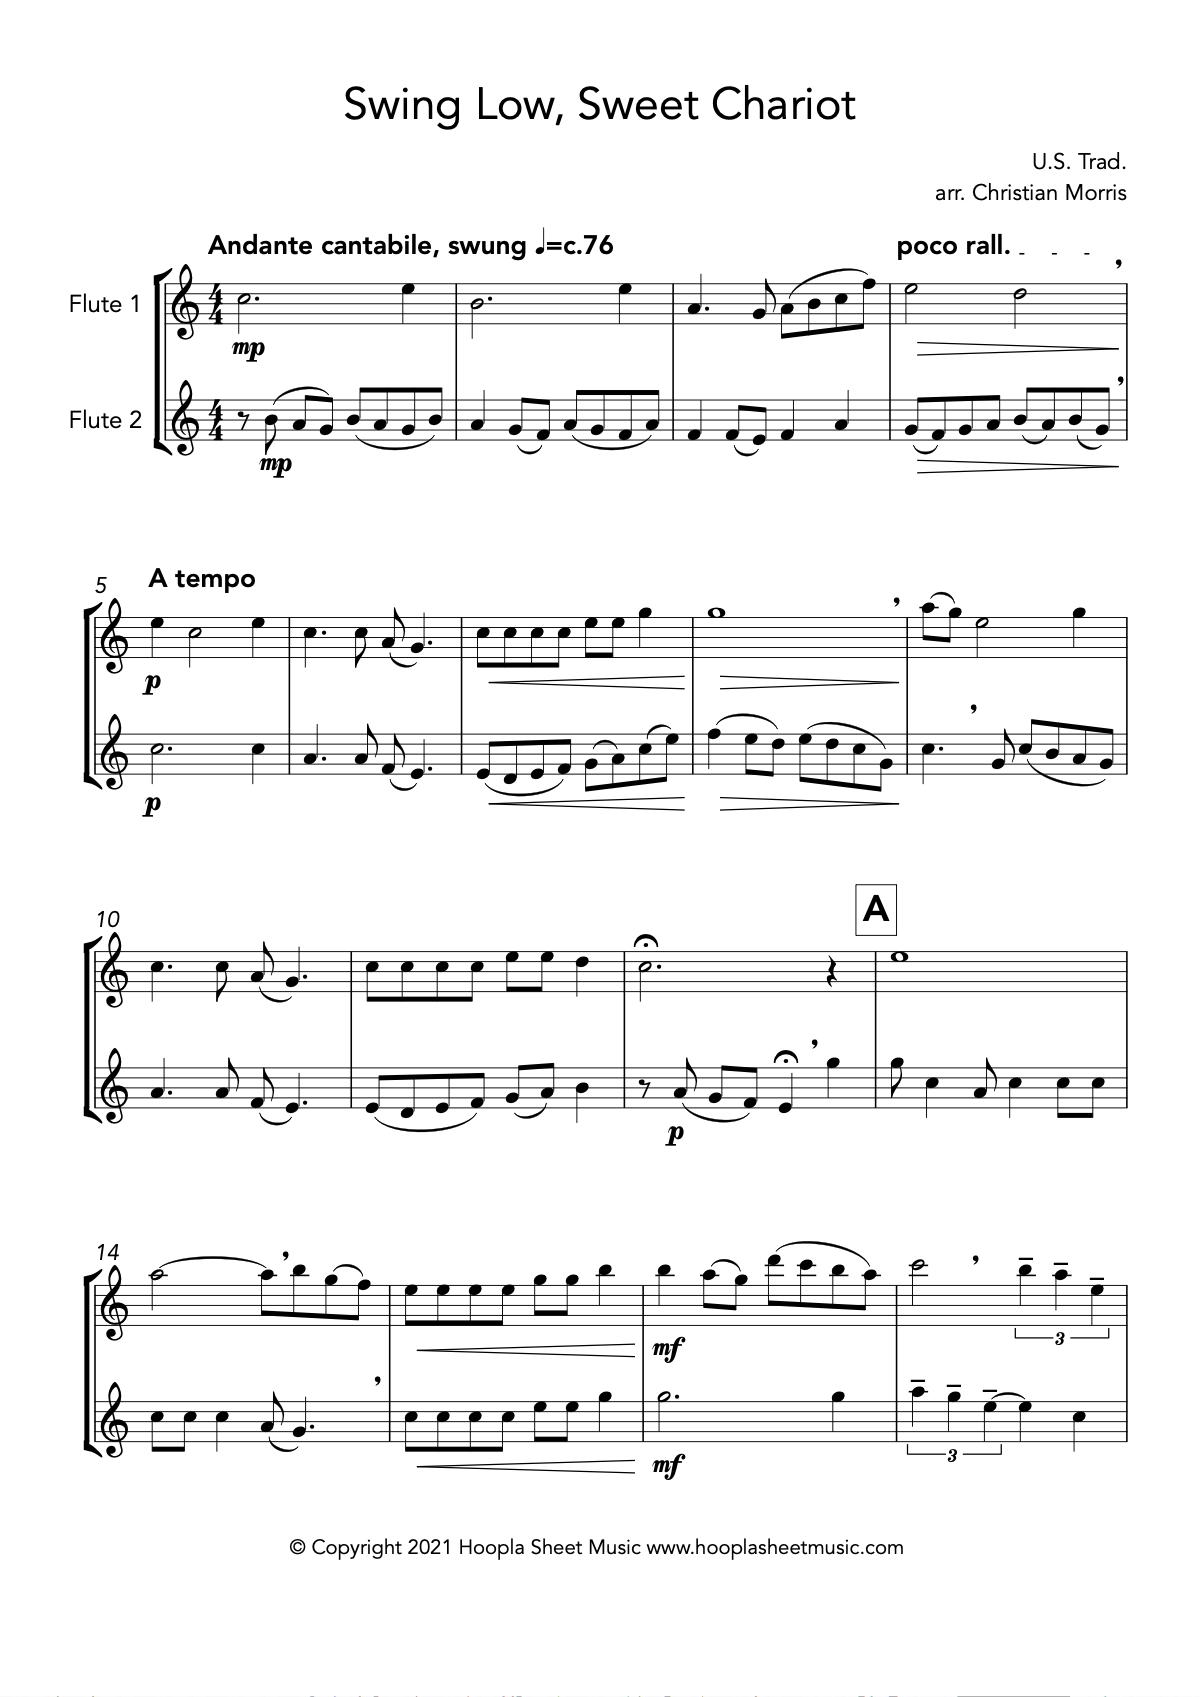 Swing Low, Sweet Chariot (Flute Duet)